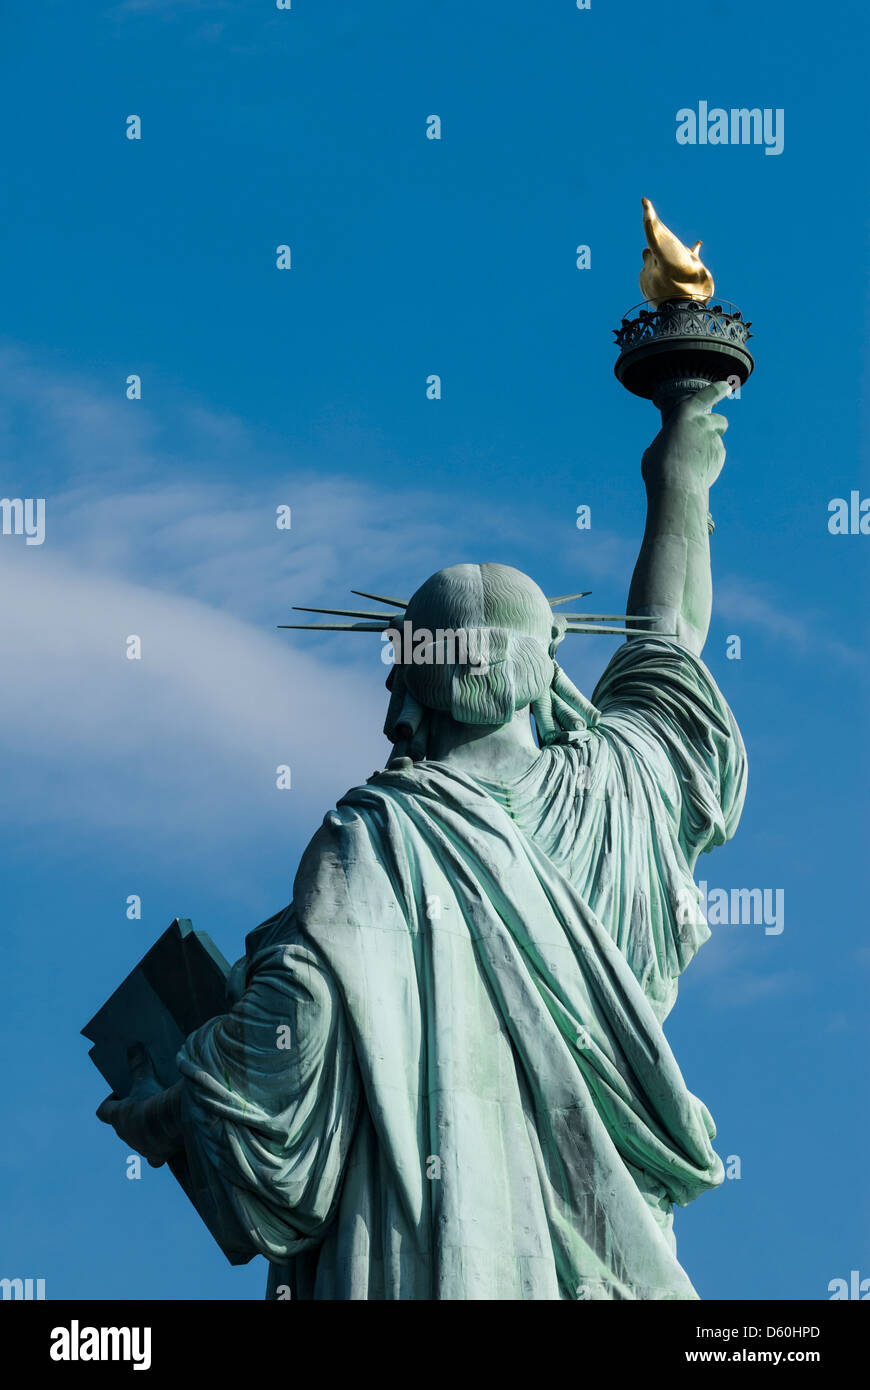 El reverso de la Estatua de la libertad, la Isla de la libertad, de la ciudad de Nueva York, Nueva York, Estados Imagen De Stock